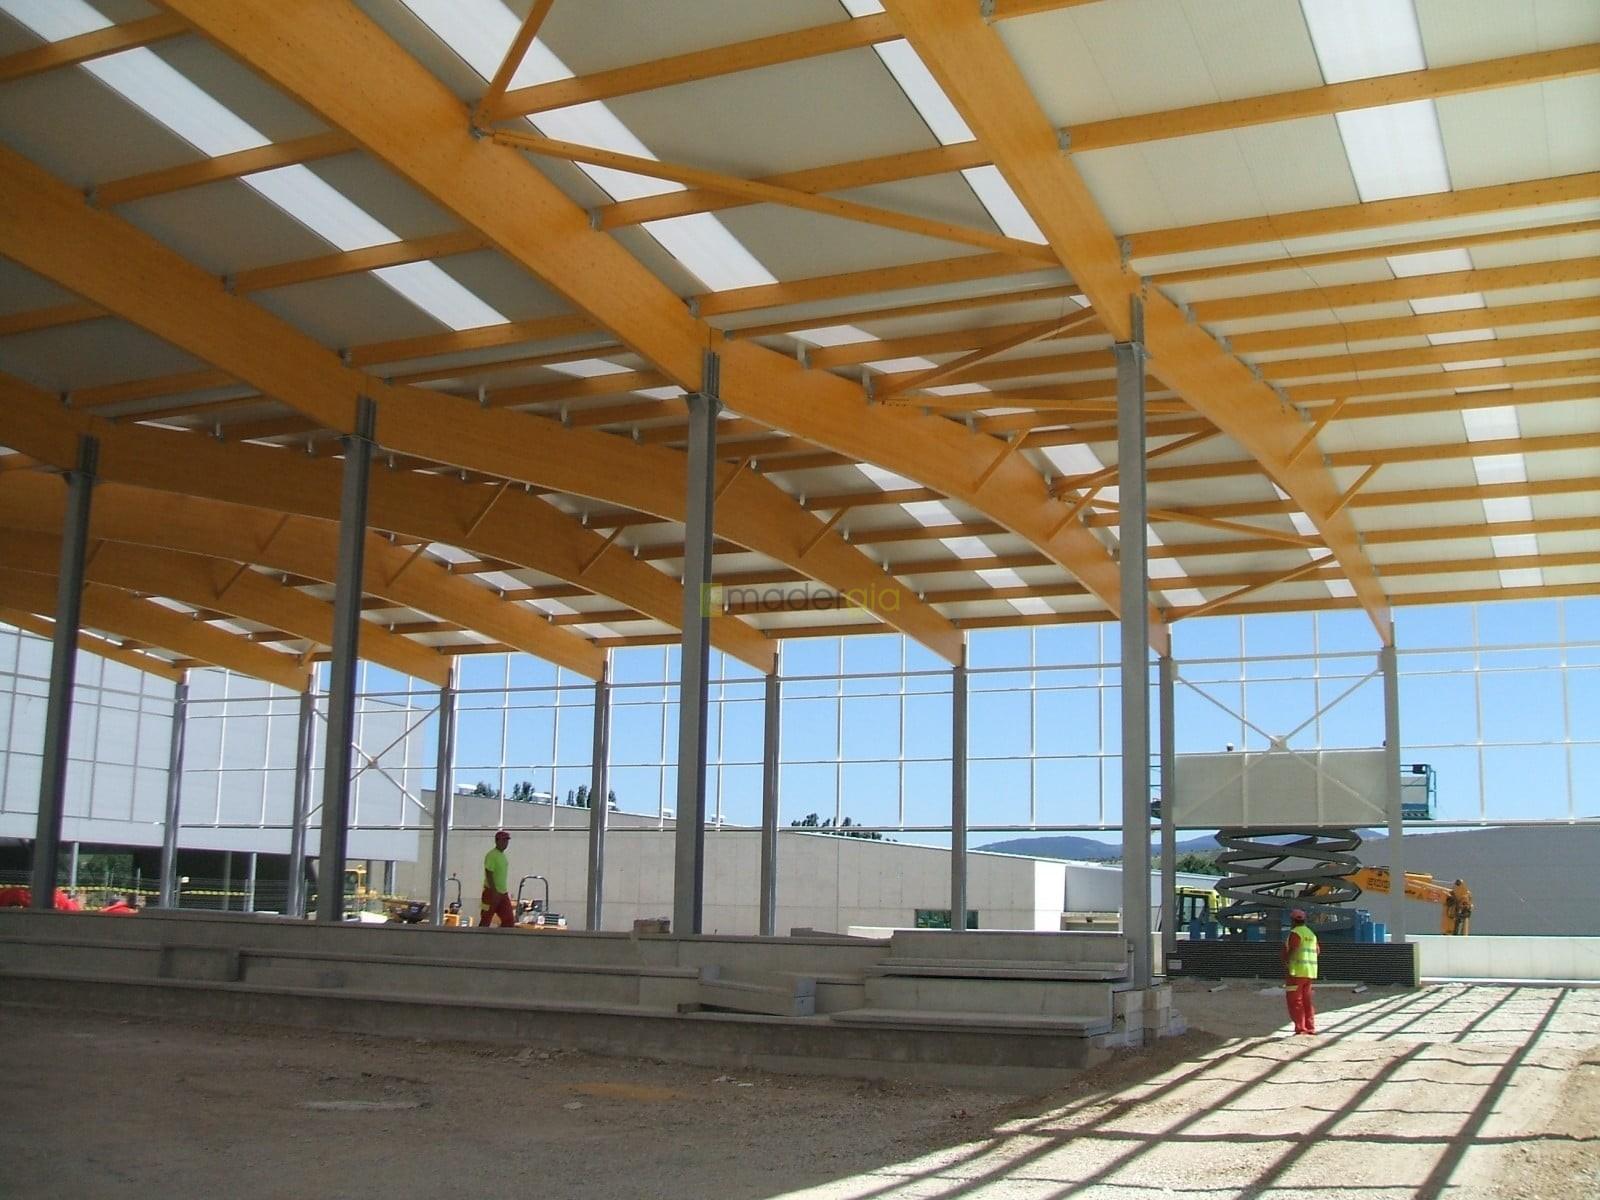 Cubierta de polideportivo madergia - Estructuras de madera laminada ...